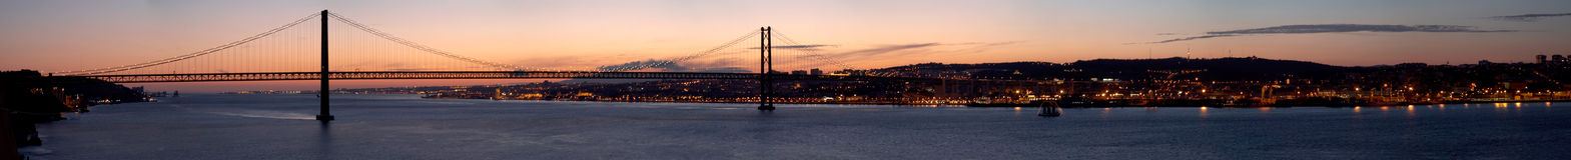 Panorama van brug 25 DE Abril Lissabon, Portugal royalty-vrije stock afbeelding